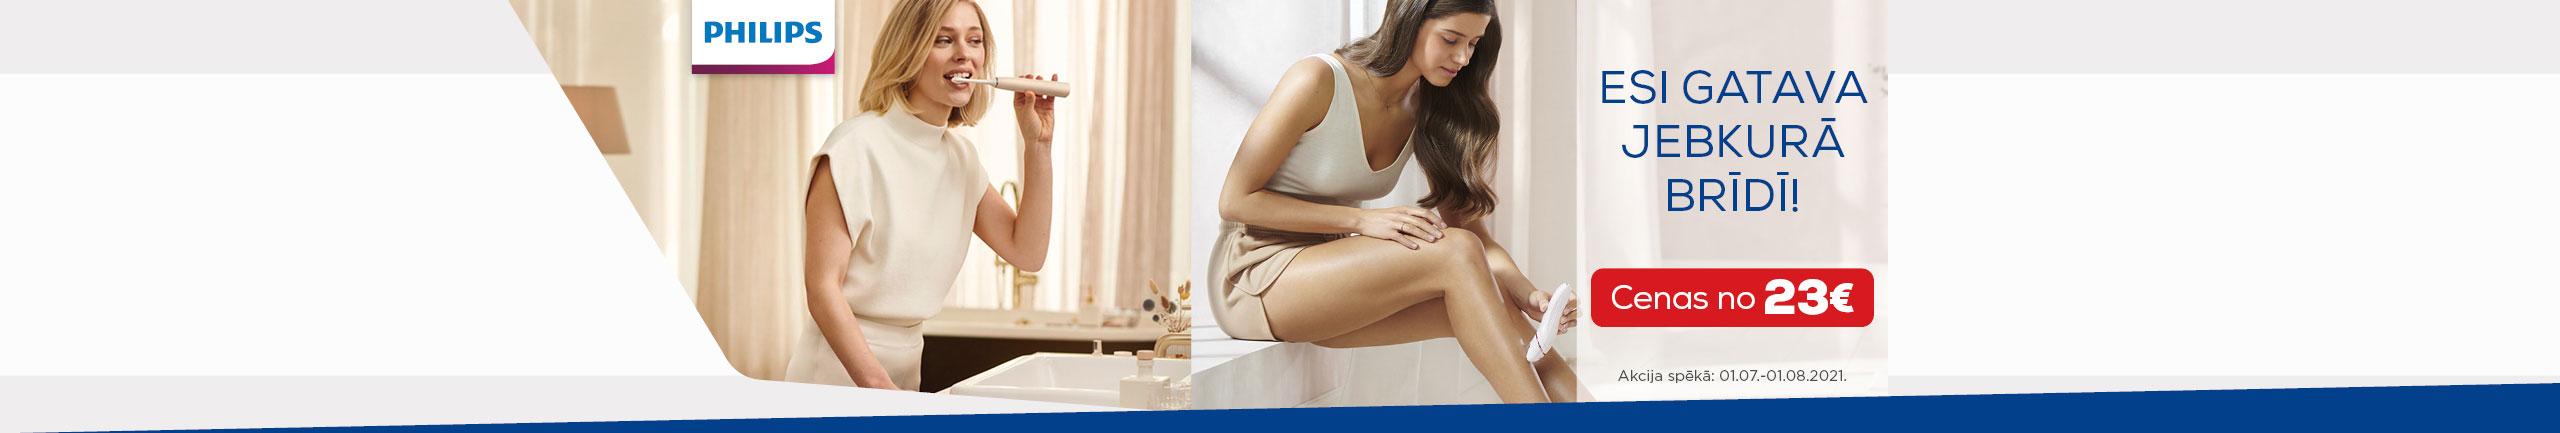 FPS Philips Beauty